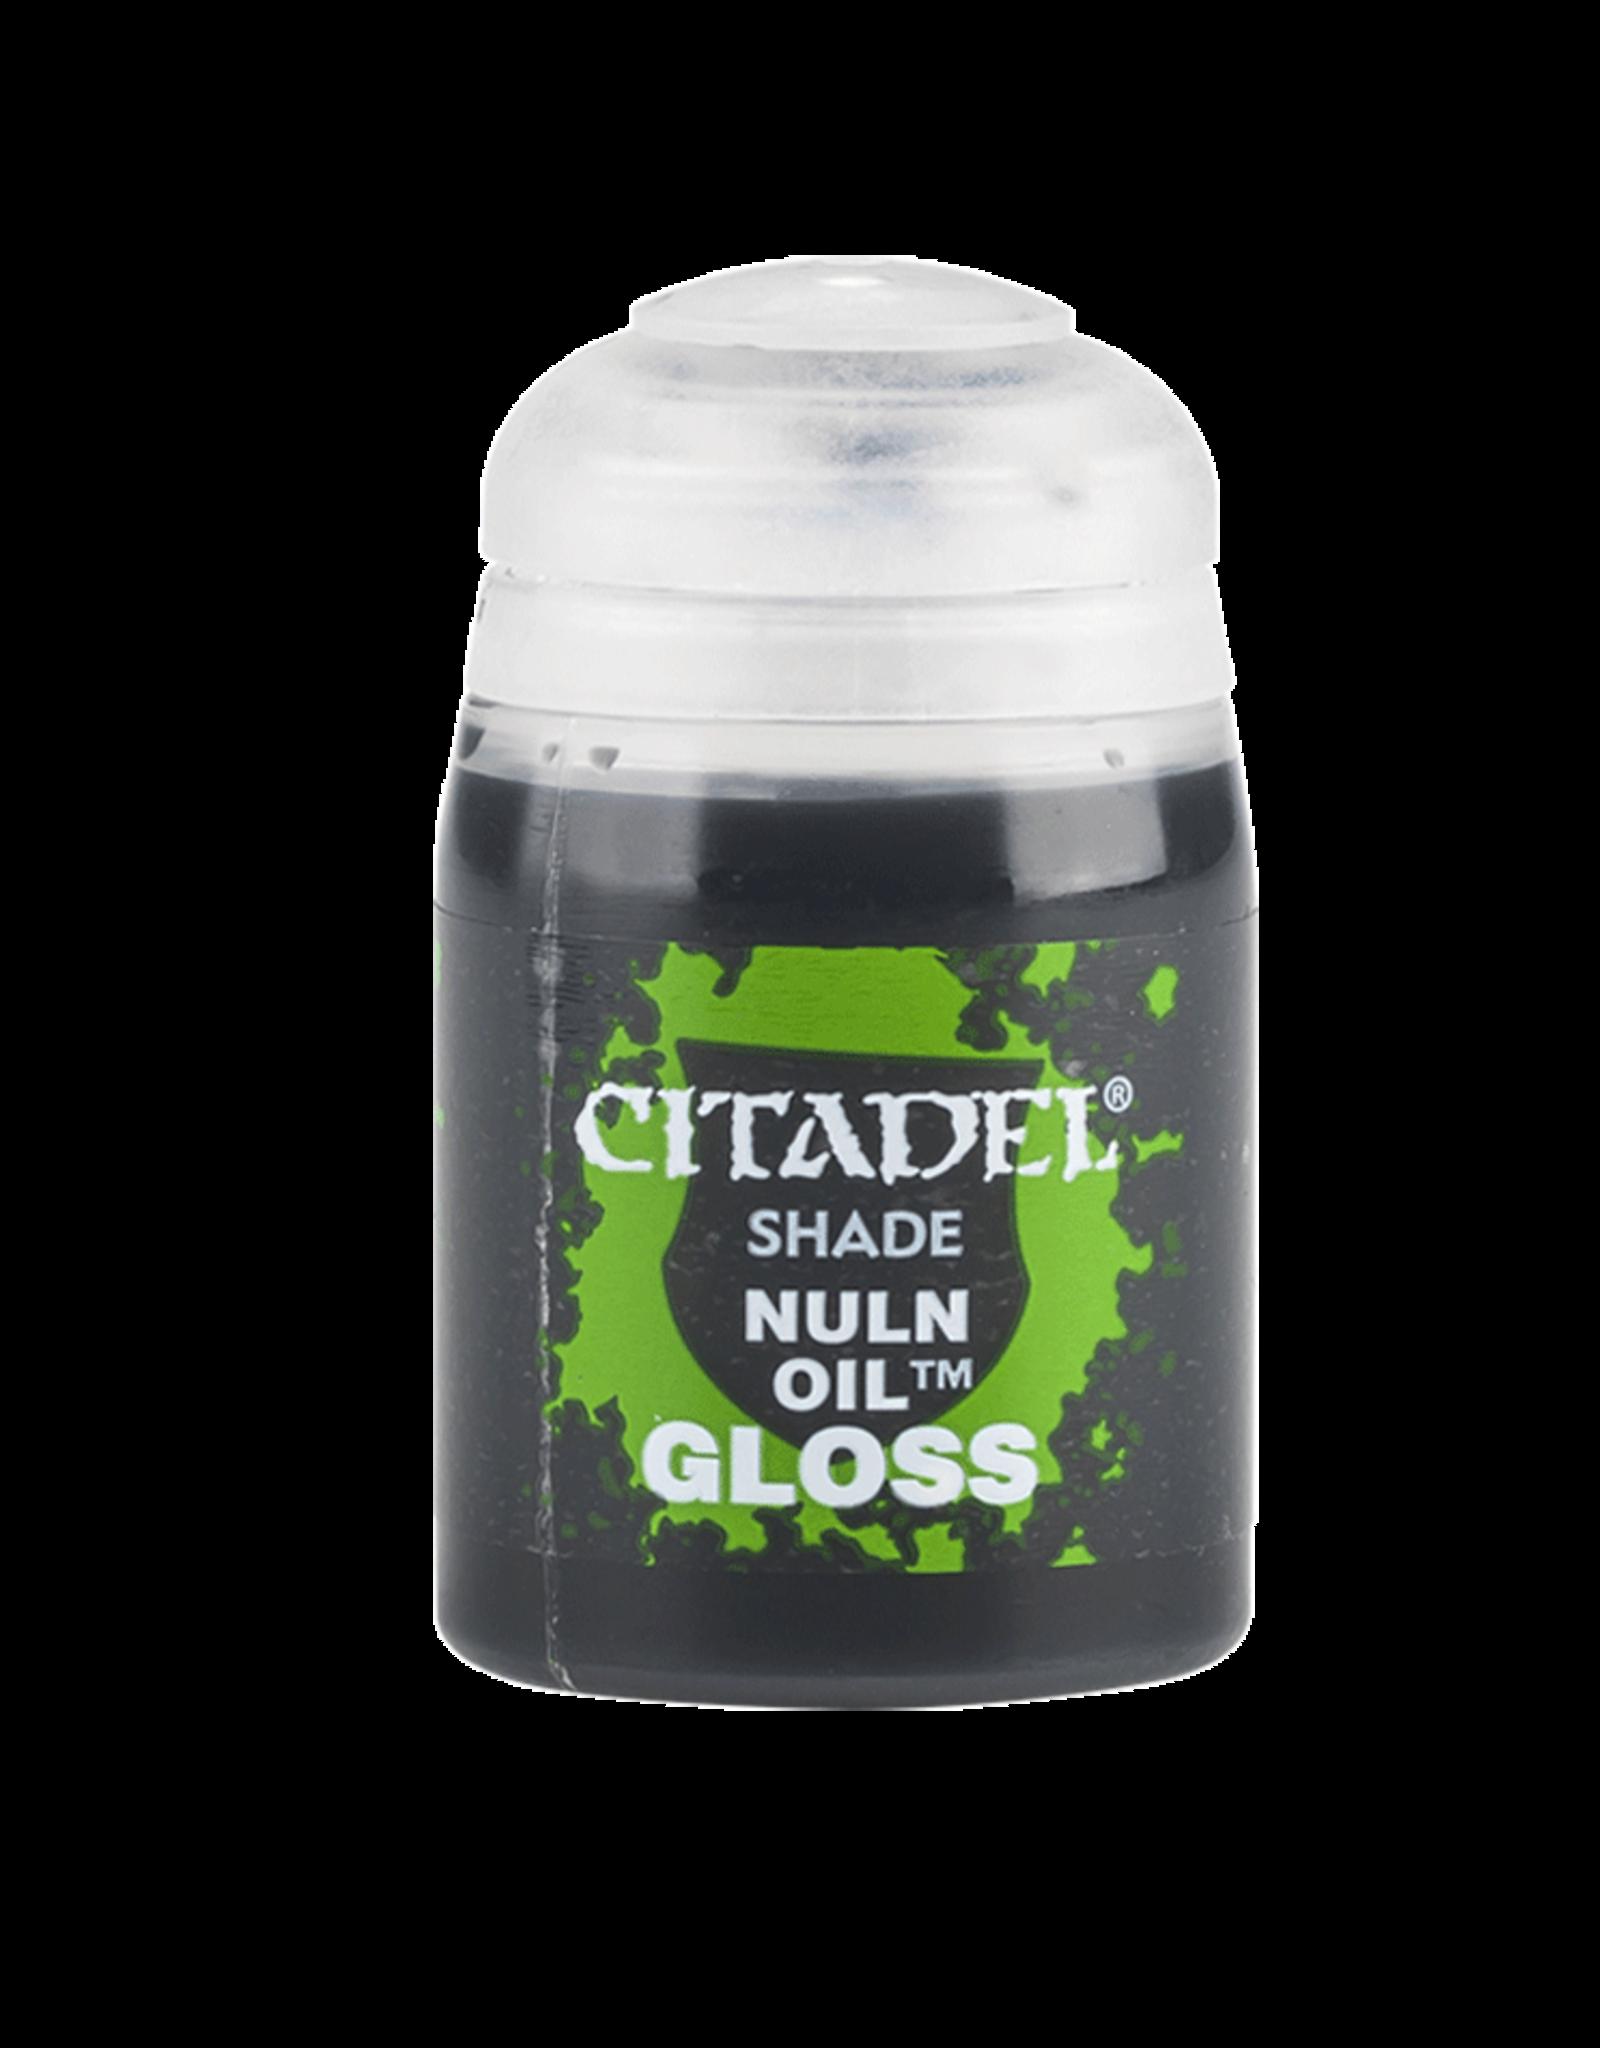 Citadel Citadel Shade: Nuln Oil Gloss (24ml)